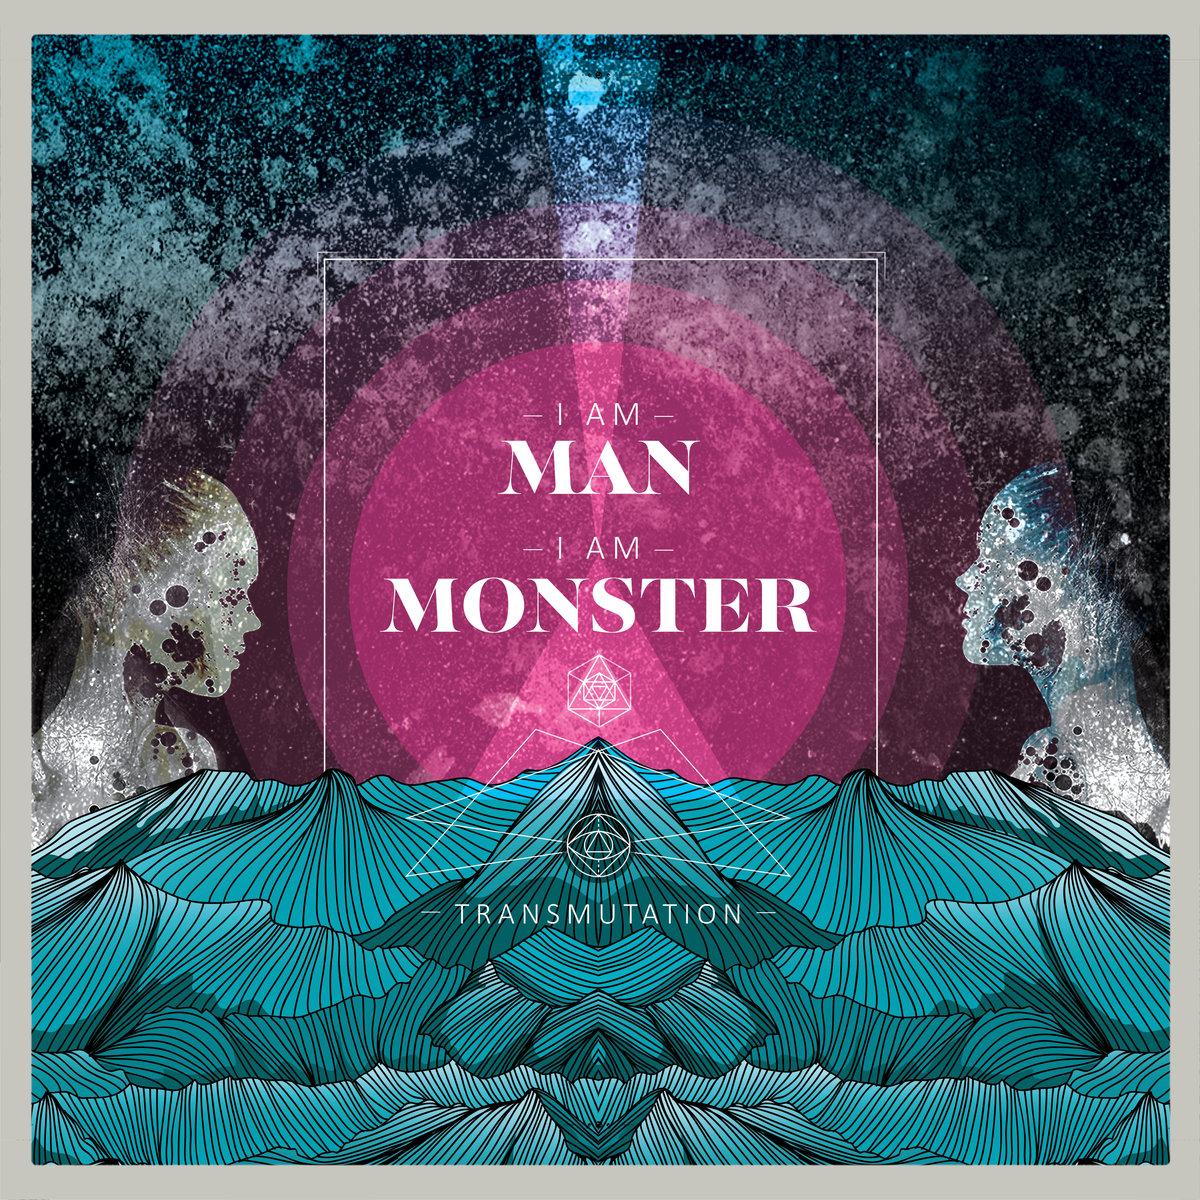 I am Man, I am Monster - Transmutation -